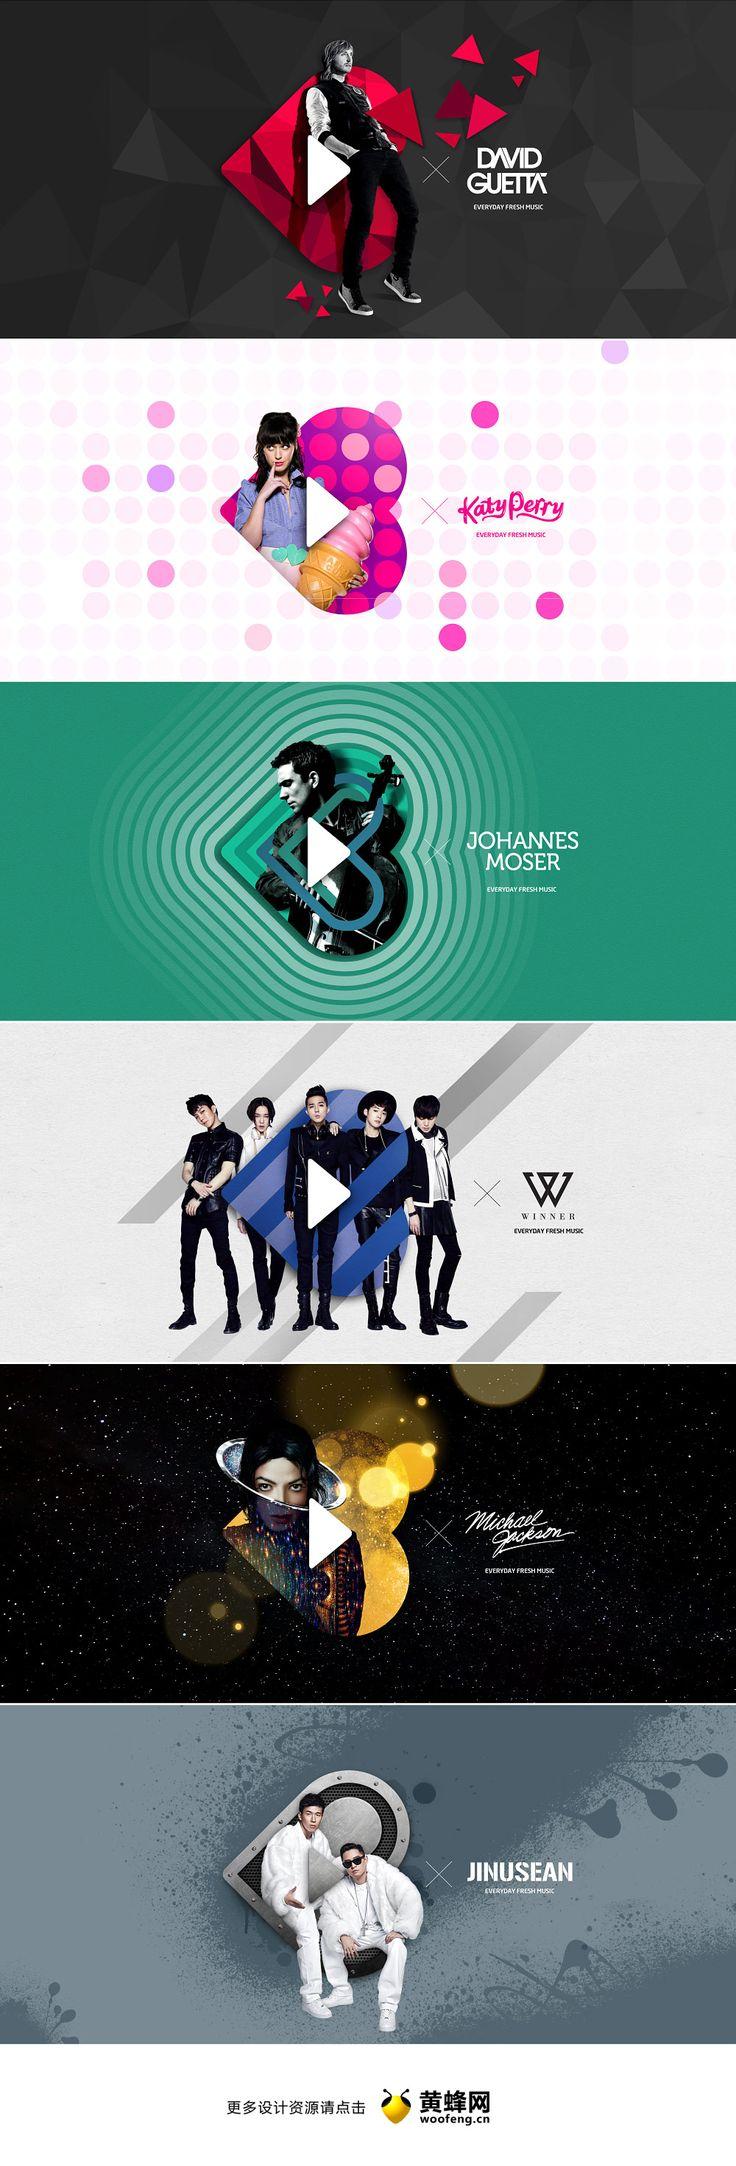 EVERYDAY FRESH MUSIC 品牌banner设计,来源自黄蜂网http://woofeng.cn/